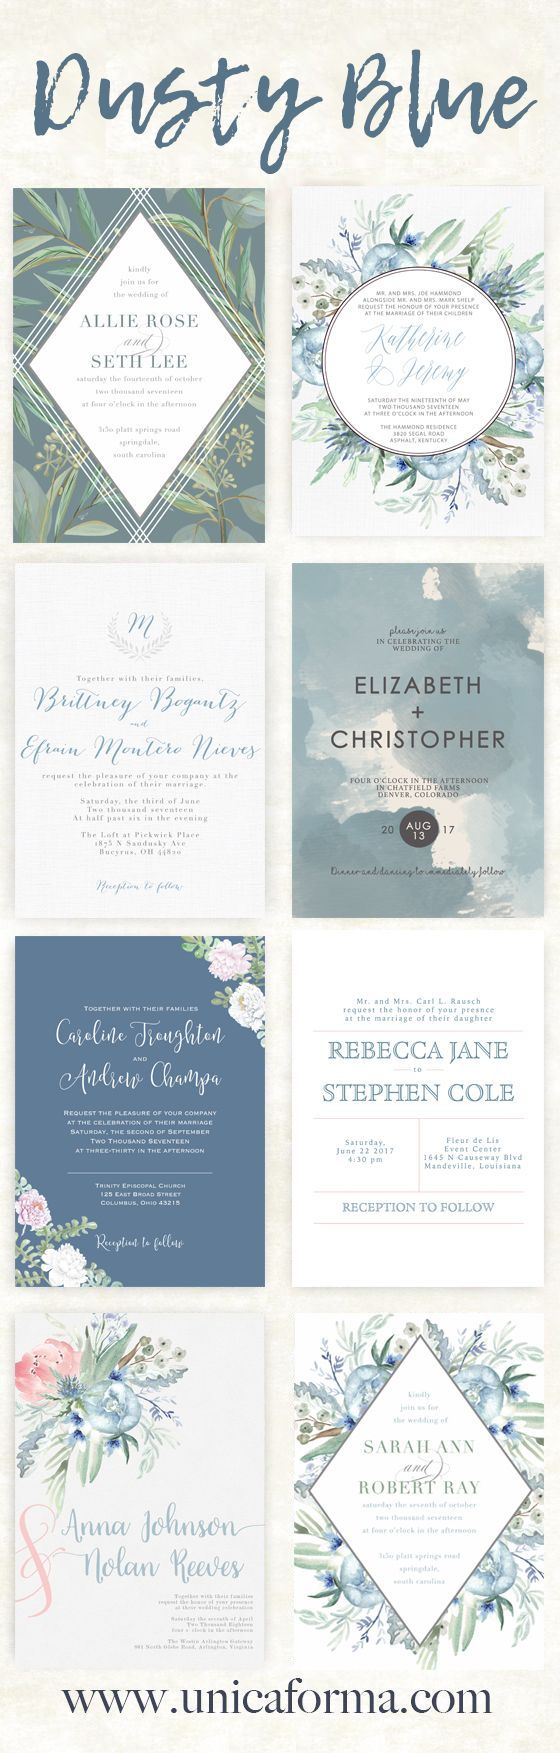 24 best Dusty Blue Wedding Inspiration images on Pinterest | Dusty ...